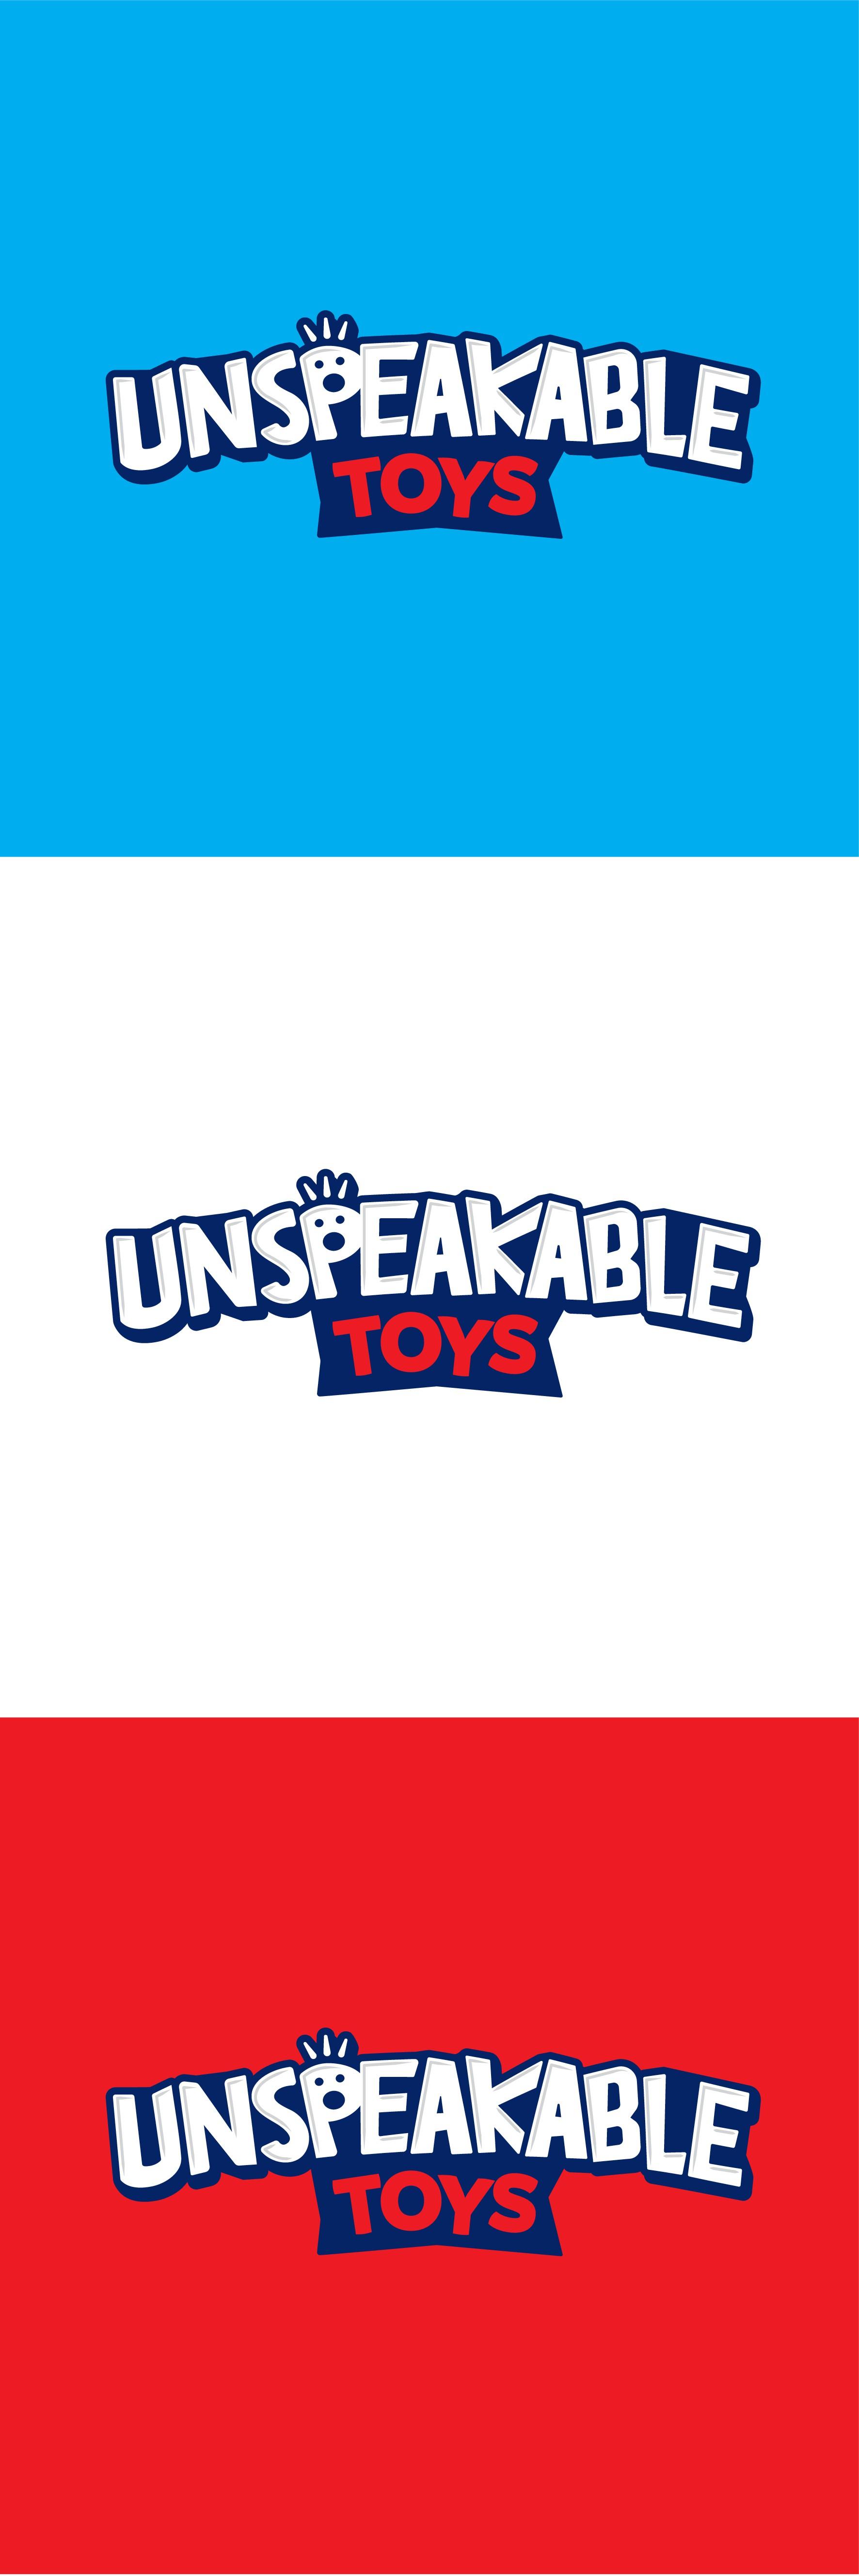 The next big Toy Brand for kids! (think Mattel, Lego, Nerf)